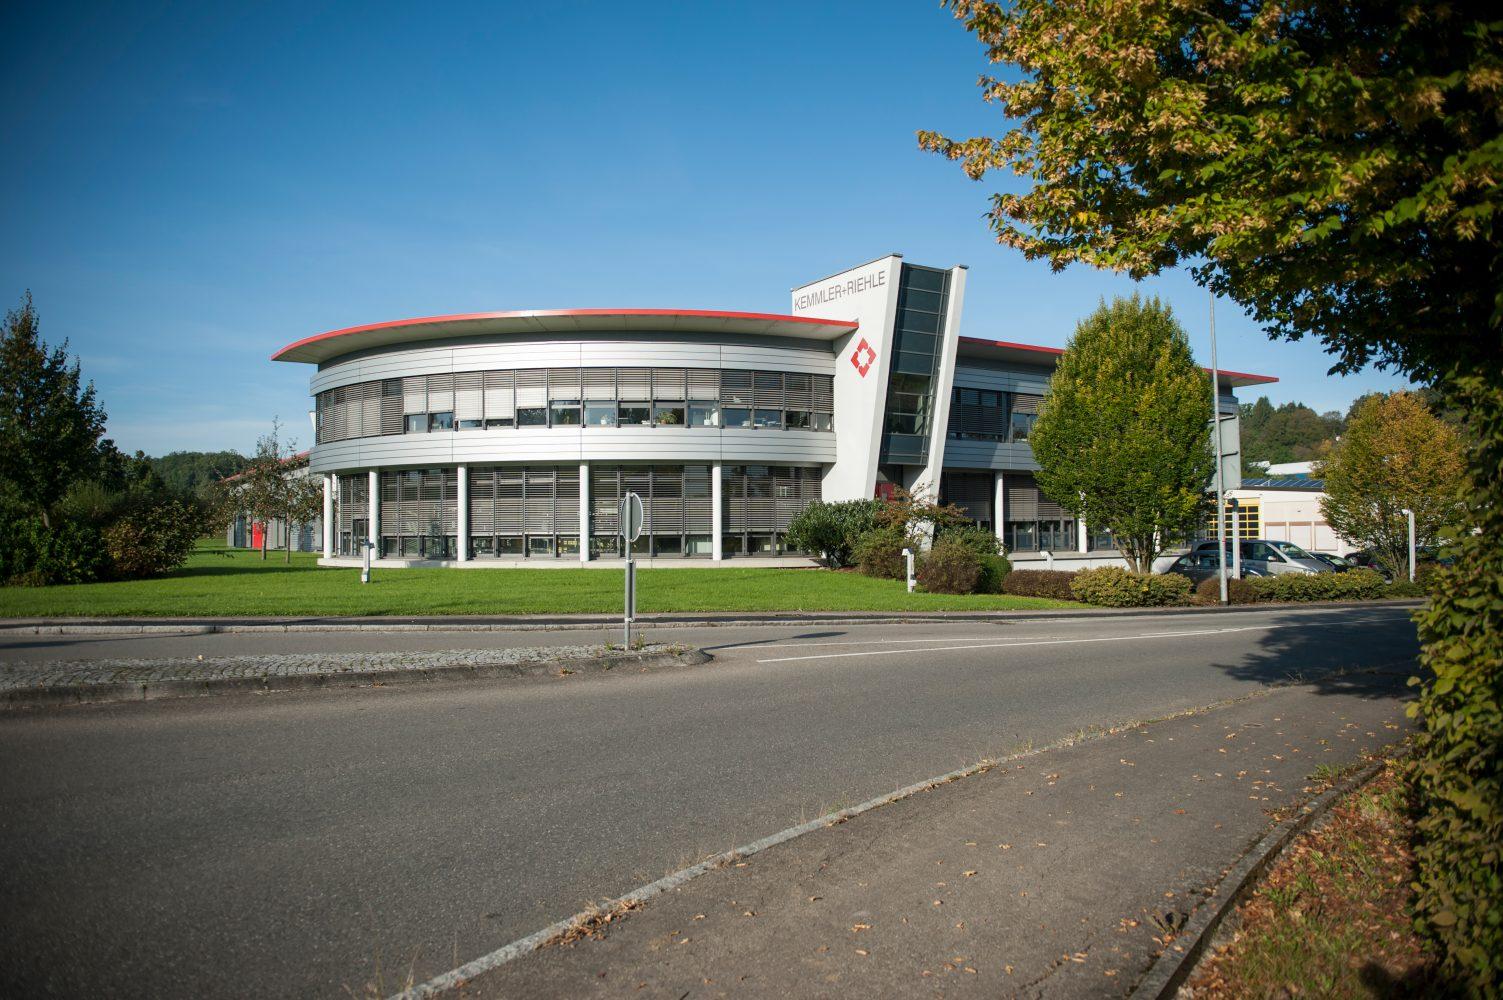 Firmenzentrale in Reutlingen (Bild: Kemmler + Riehle GmbH & Co. KG)